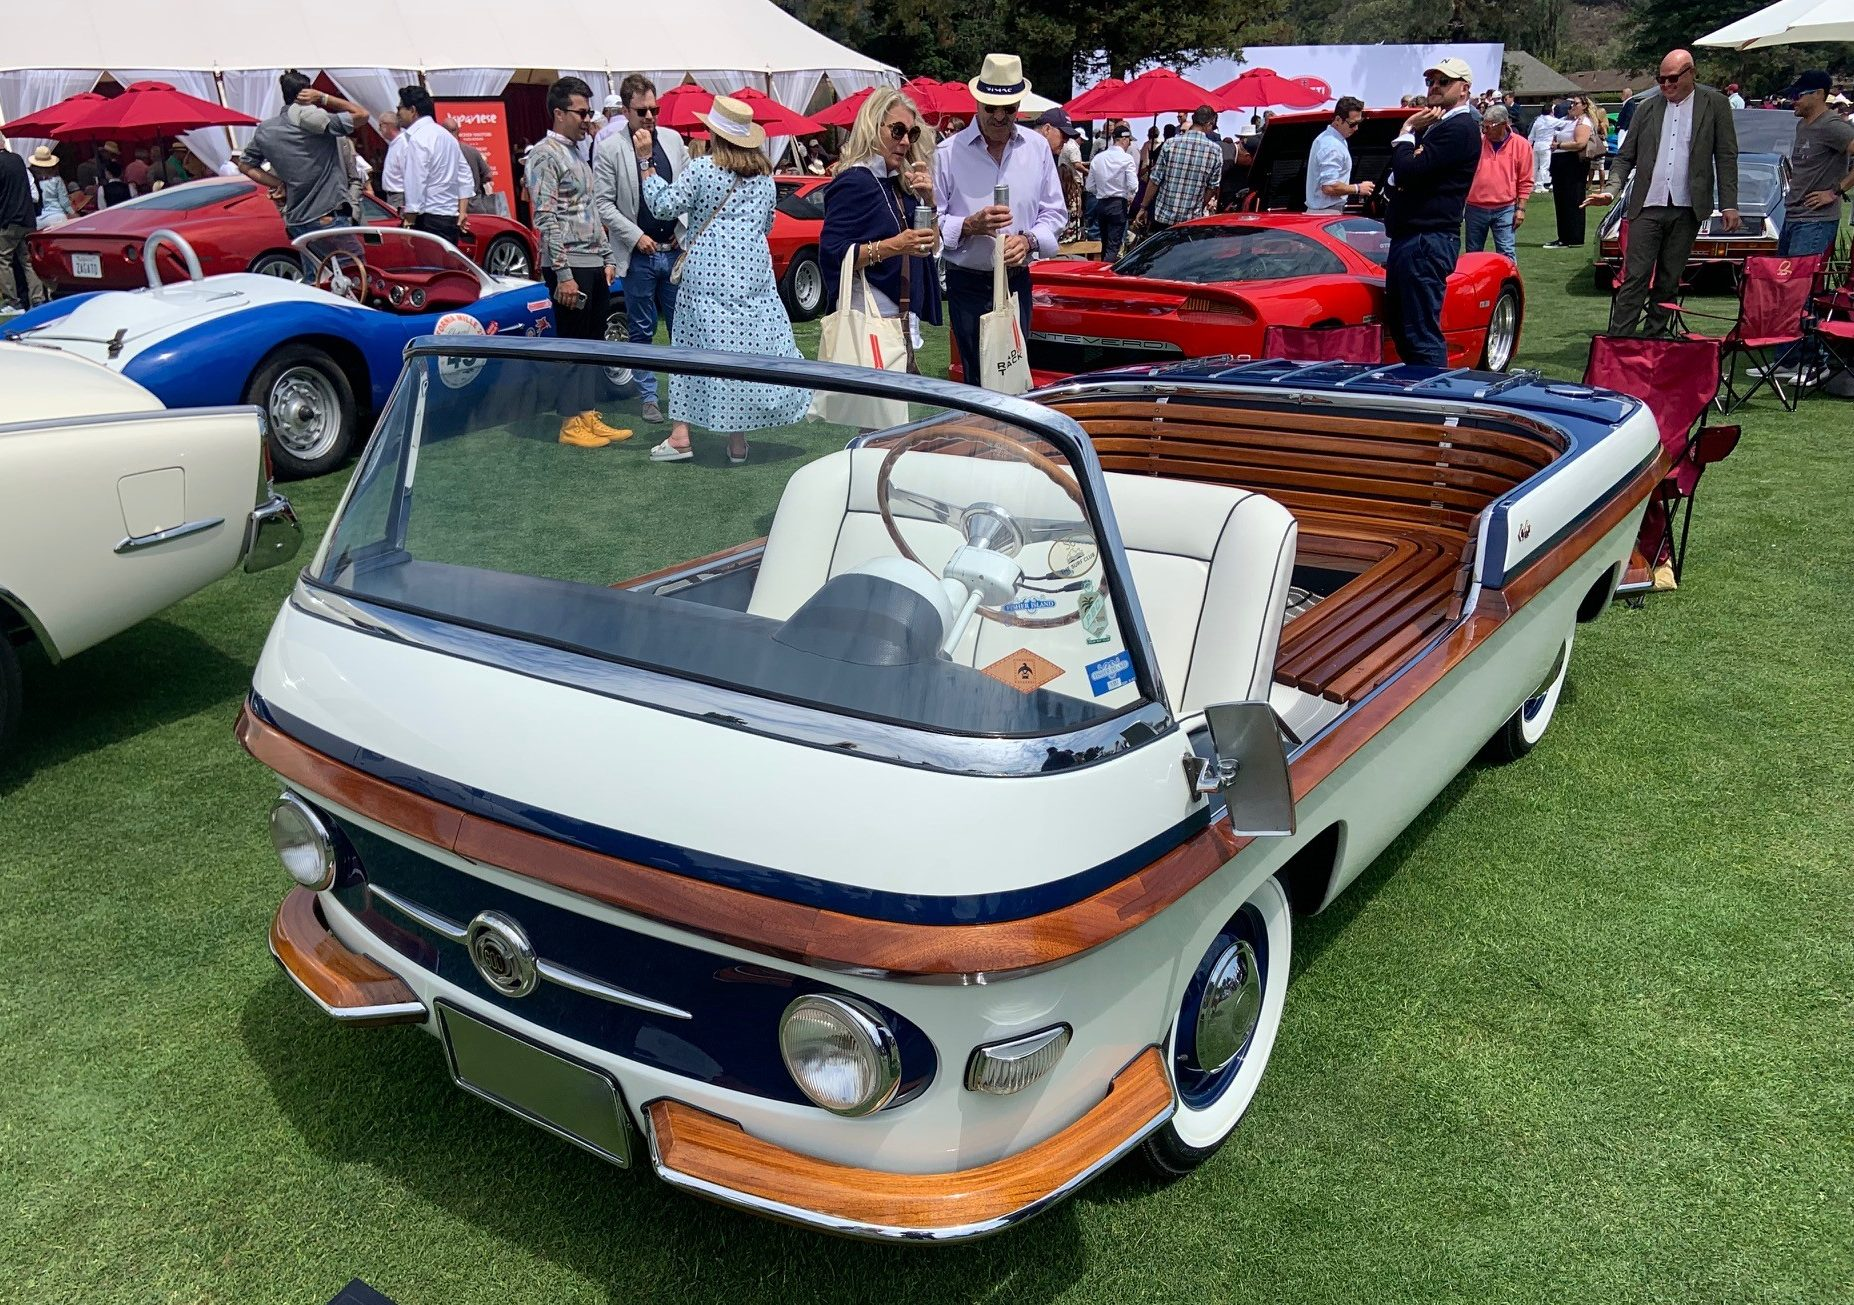 1957 Fiat 600 Eden Roc - full from front